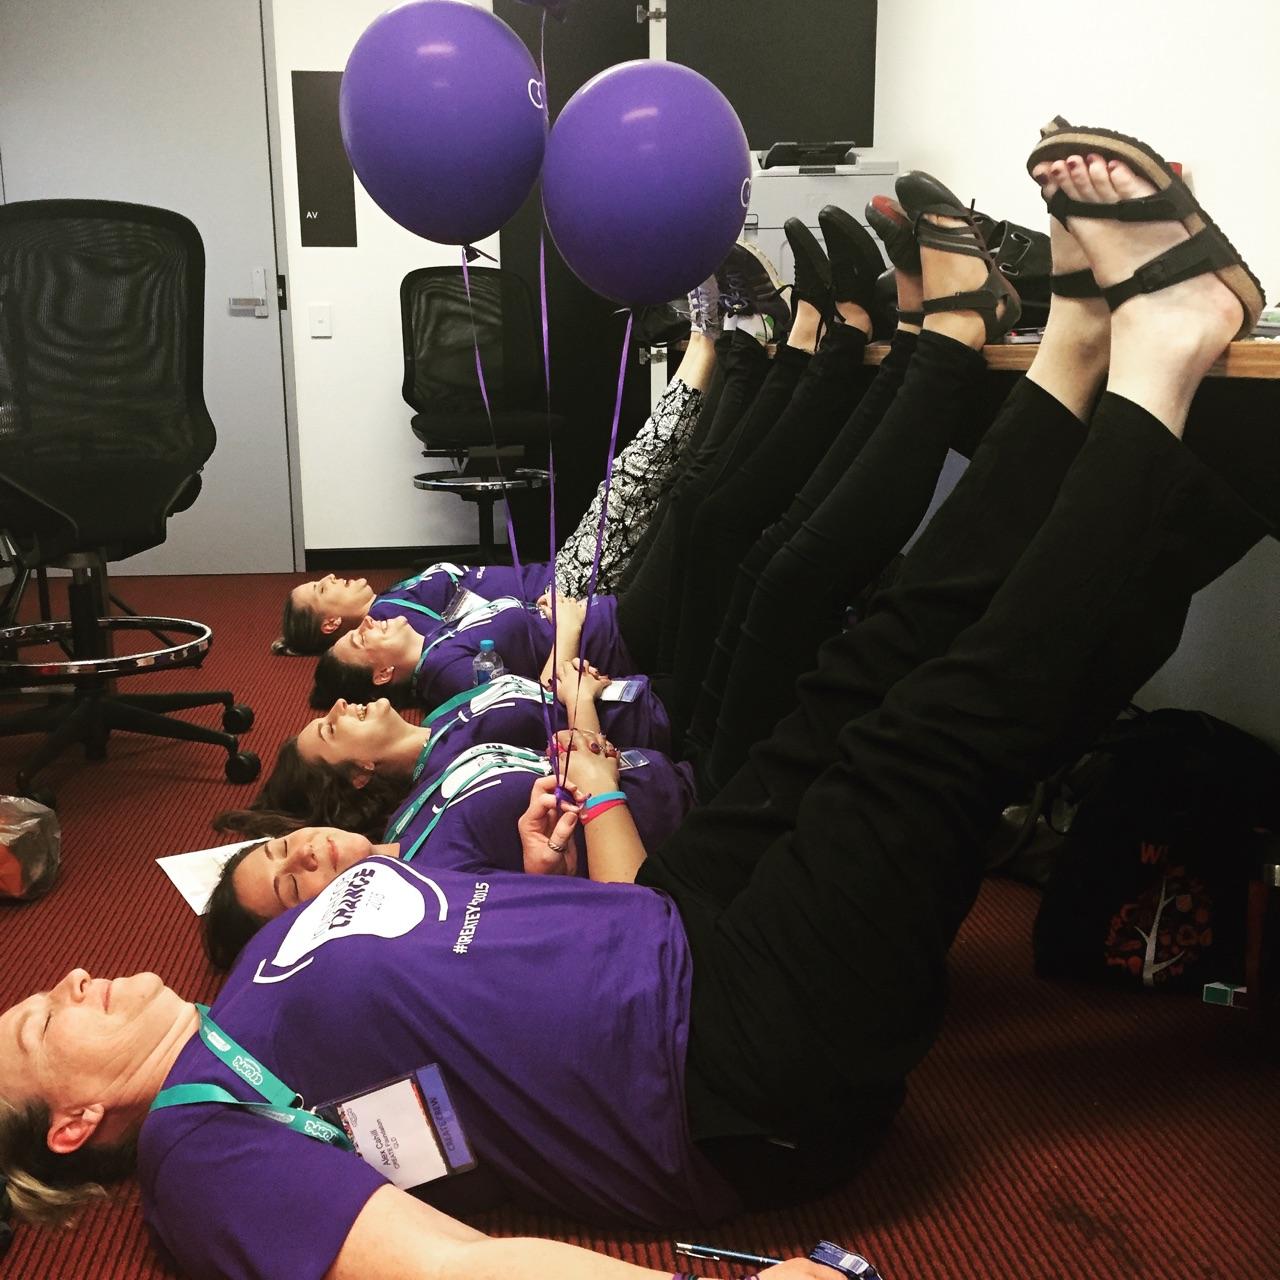 Staff tired